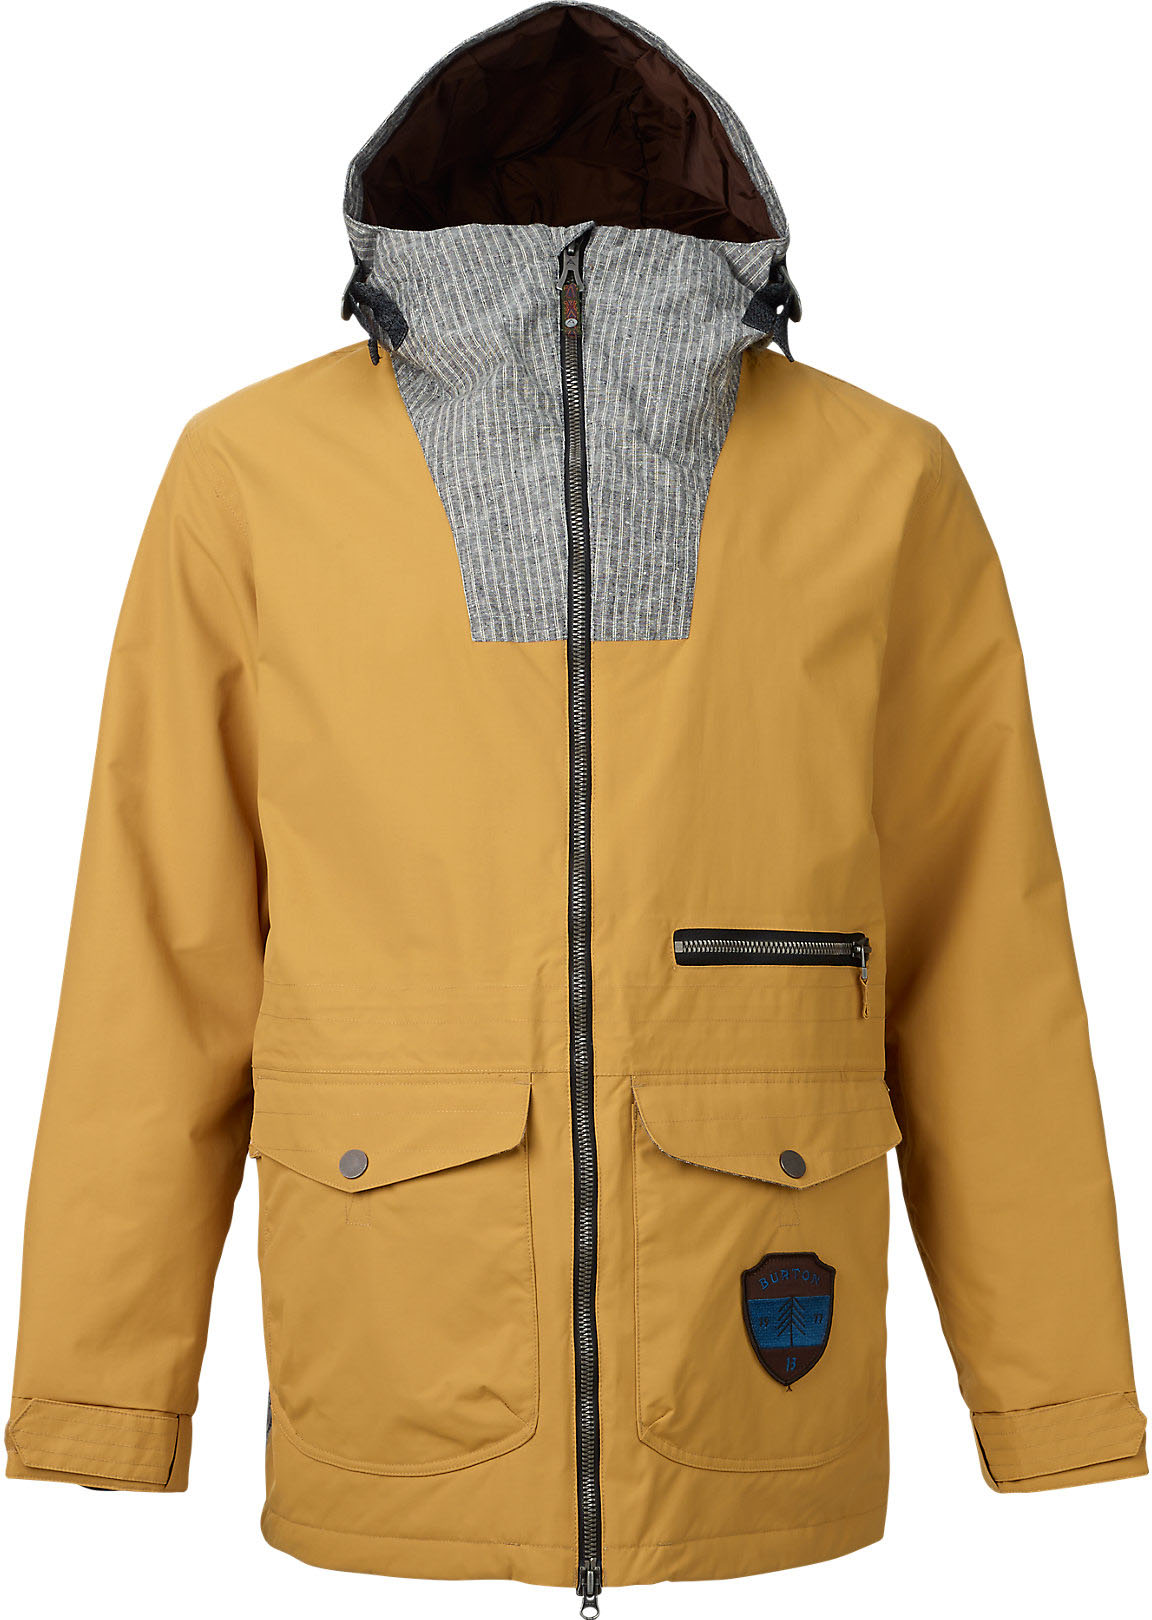 Burton Cambridge Jacket Review The Good Ride